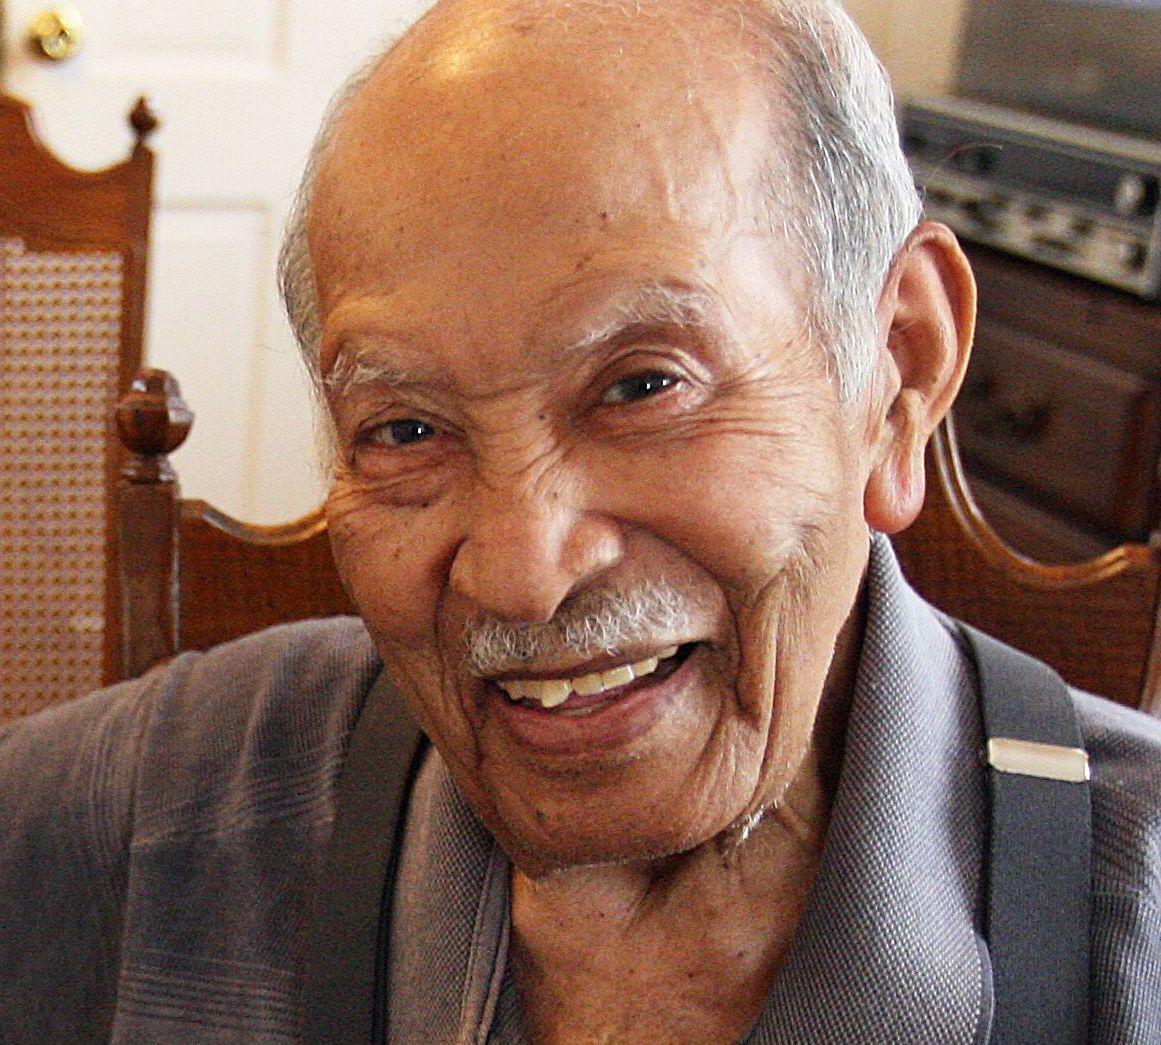 Tuskegee Airman Gibson dies at 89